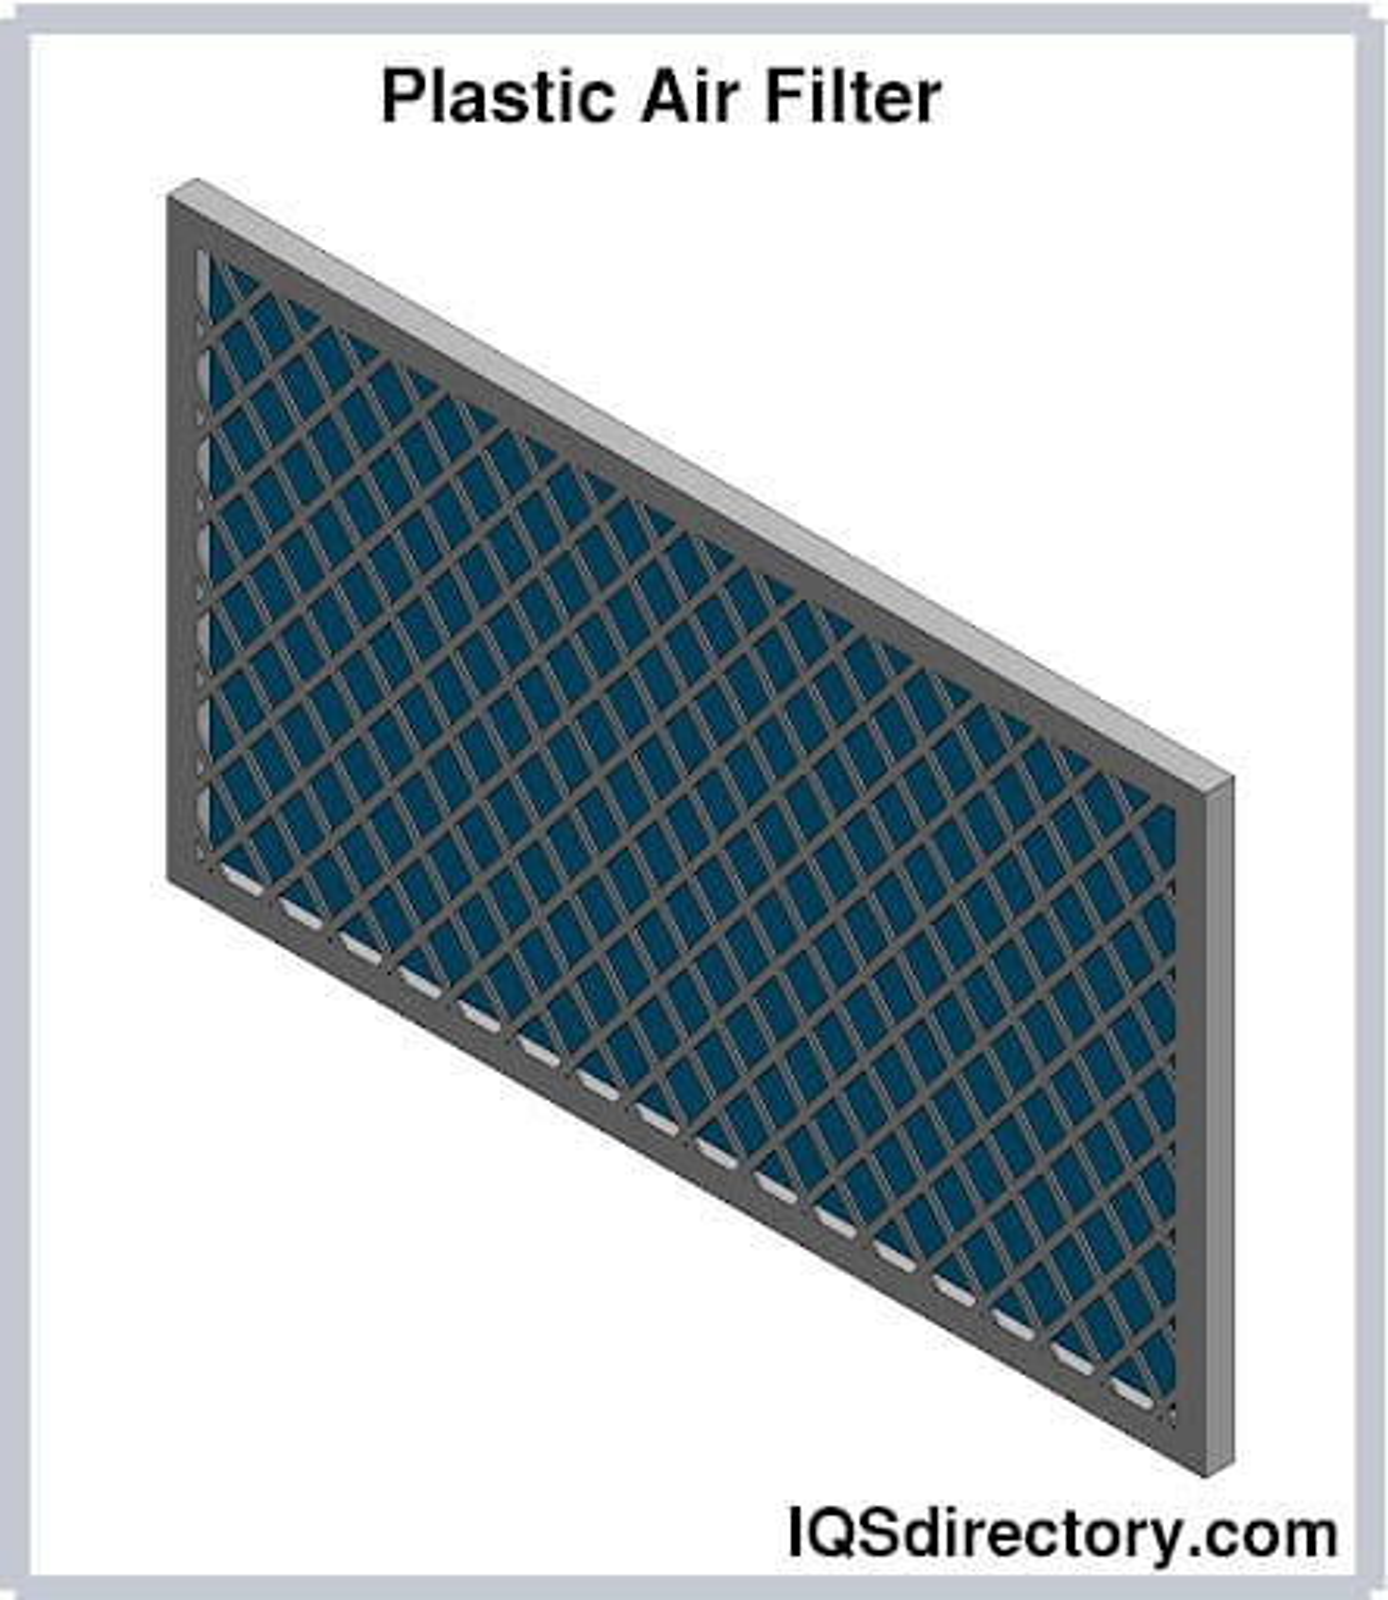 Plastic Air Filter